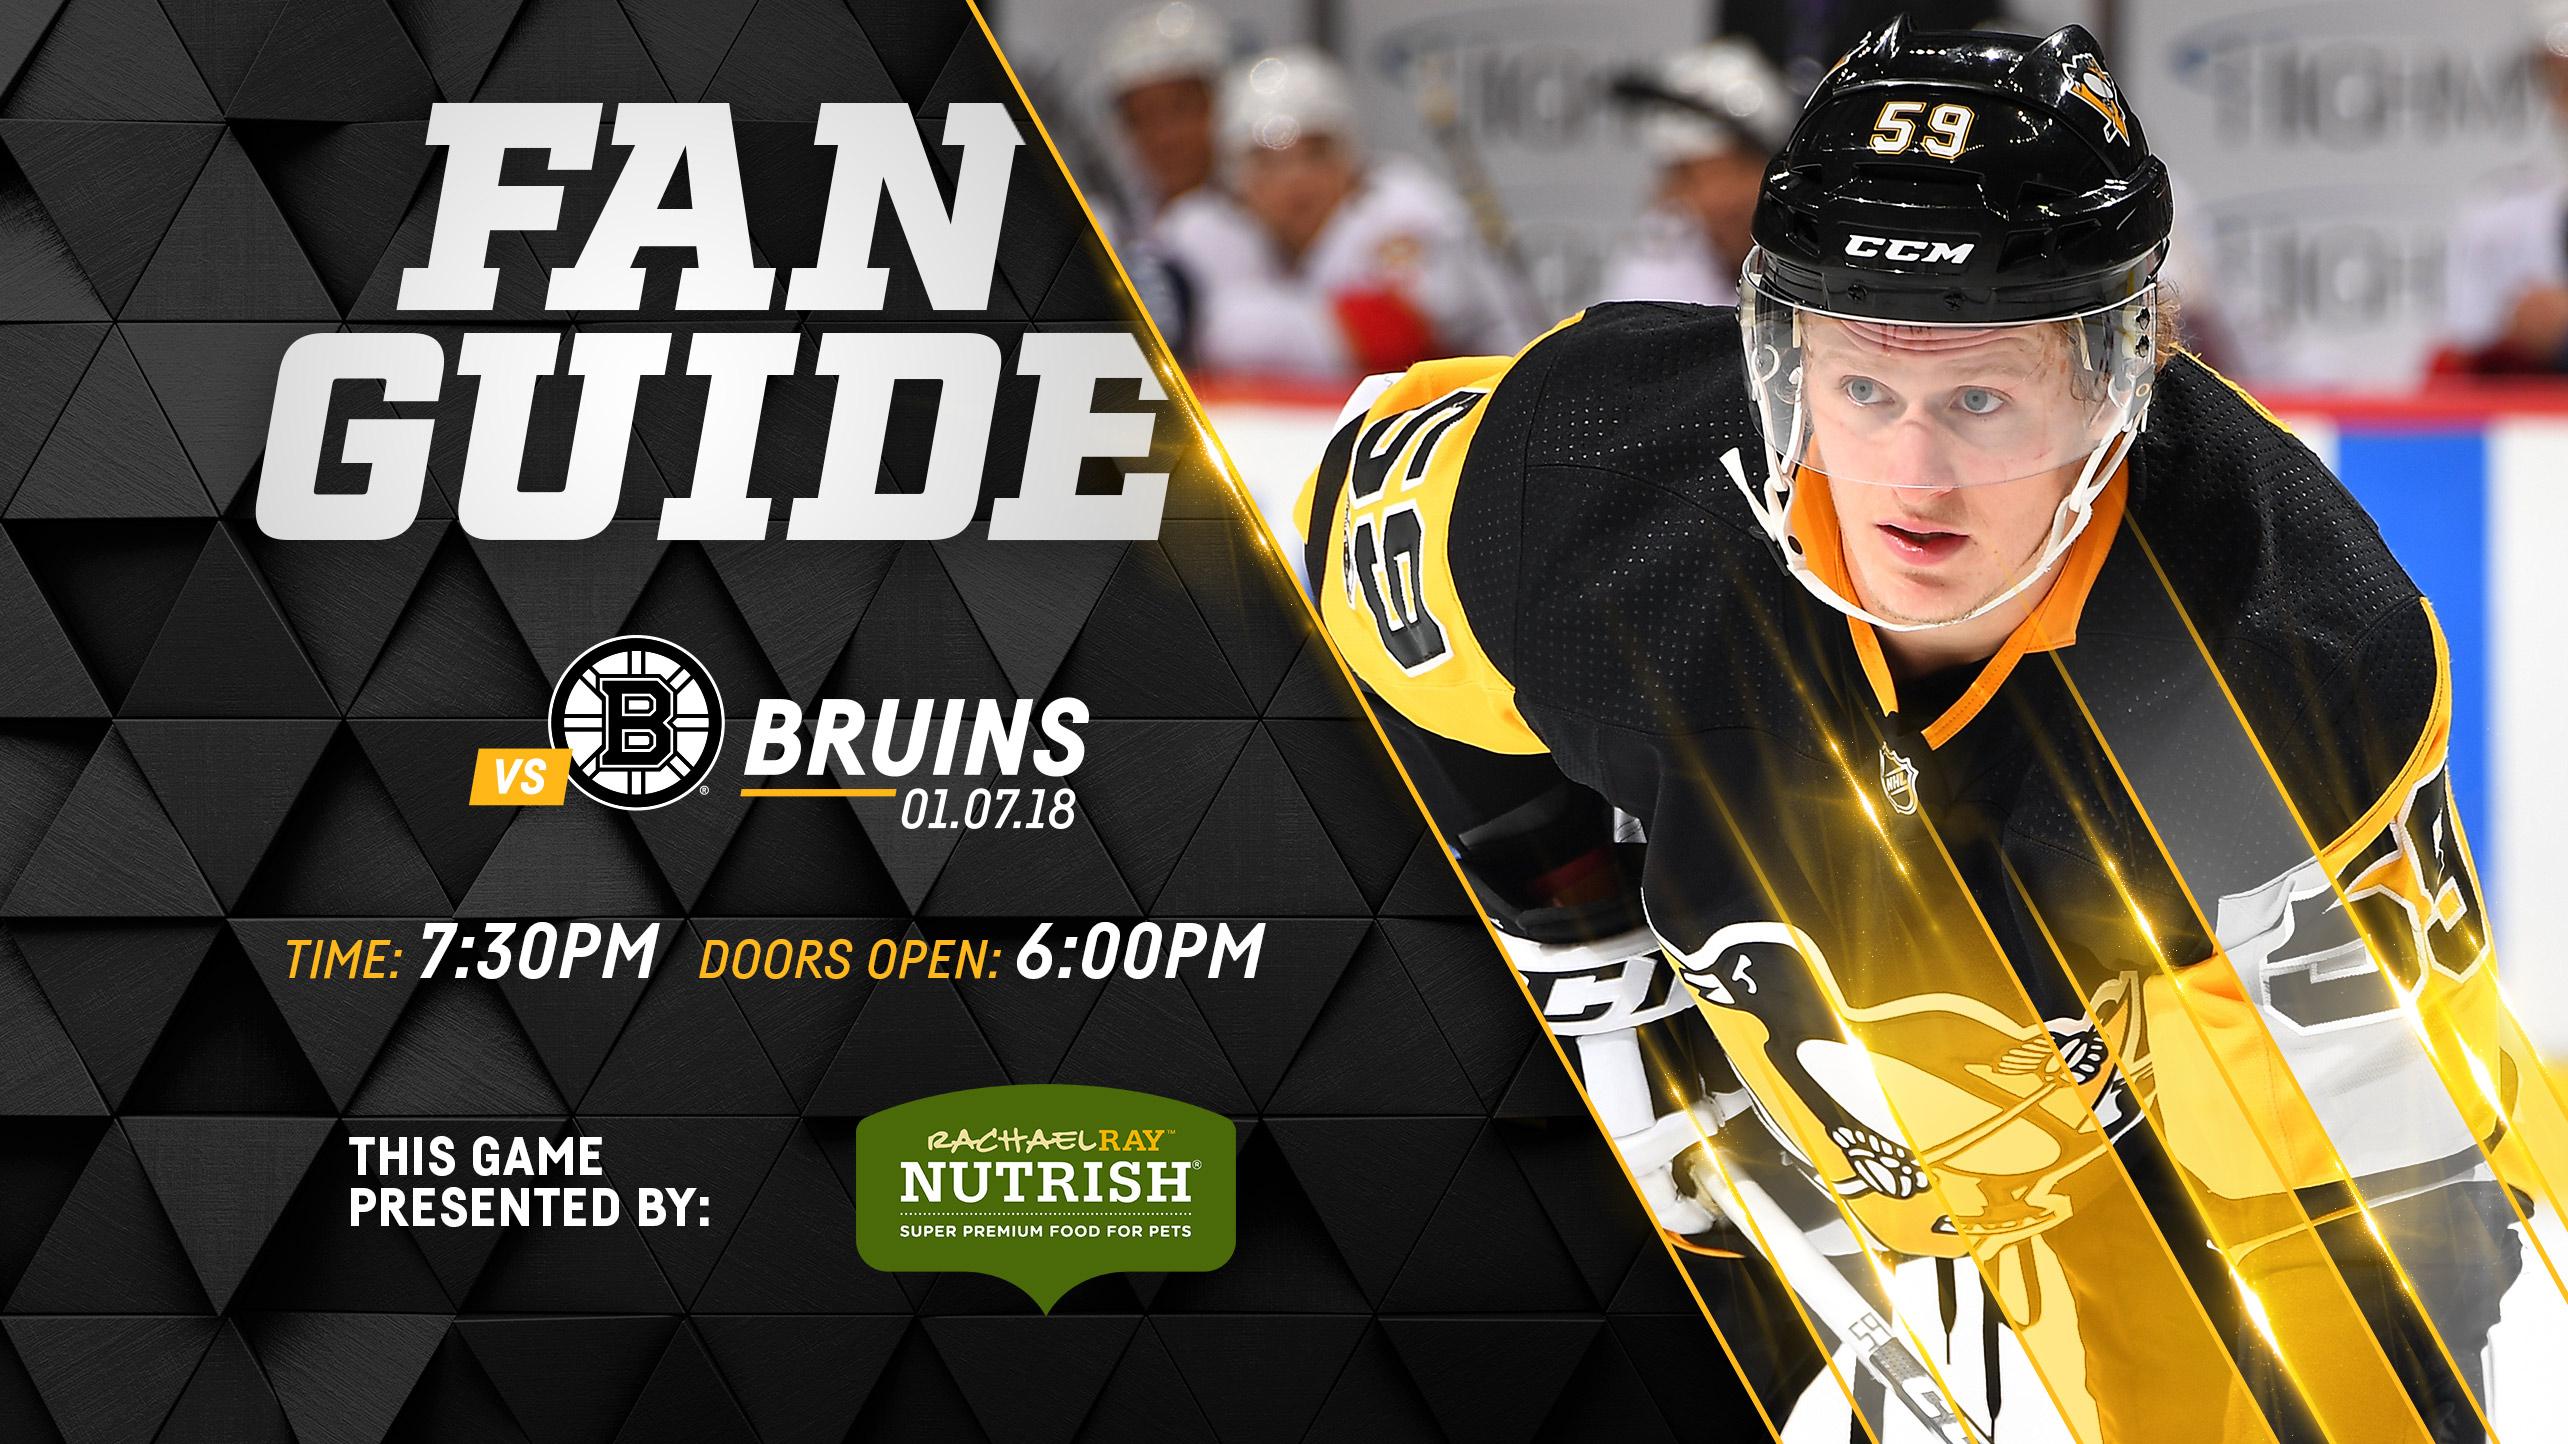 Official Boston Bruins Website m Bruins game fan photos